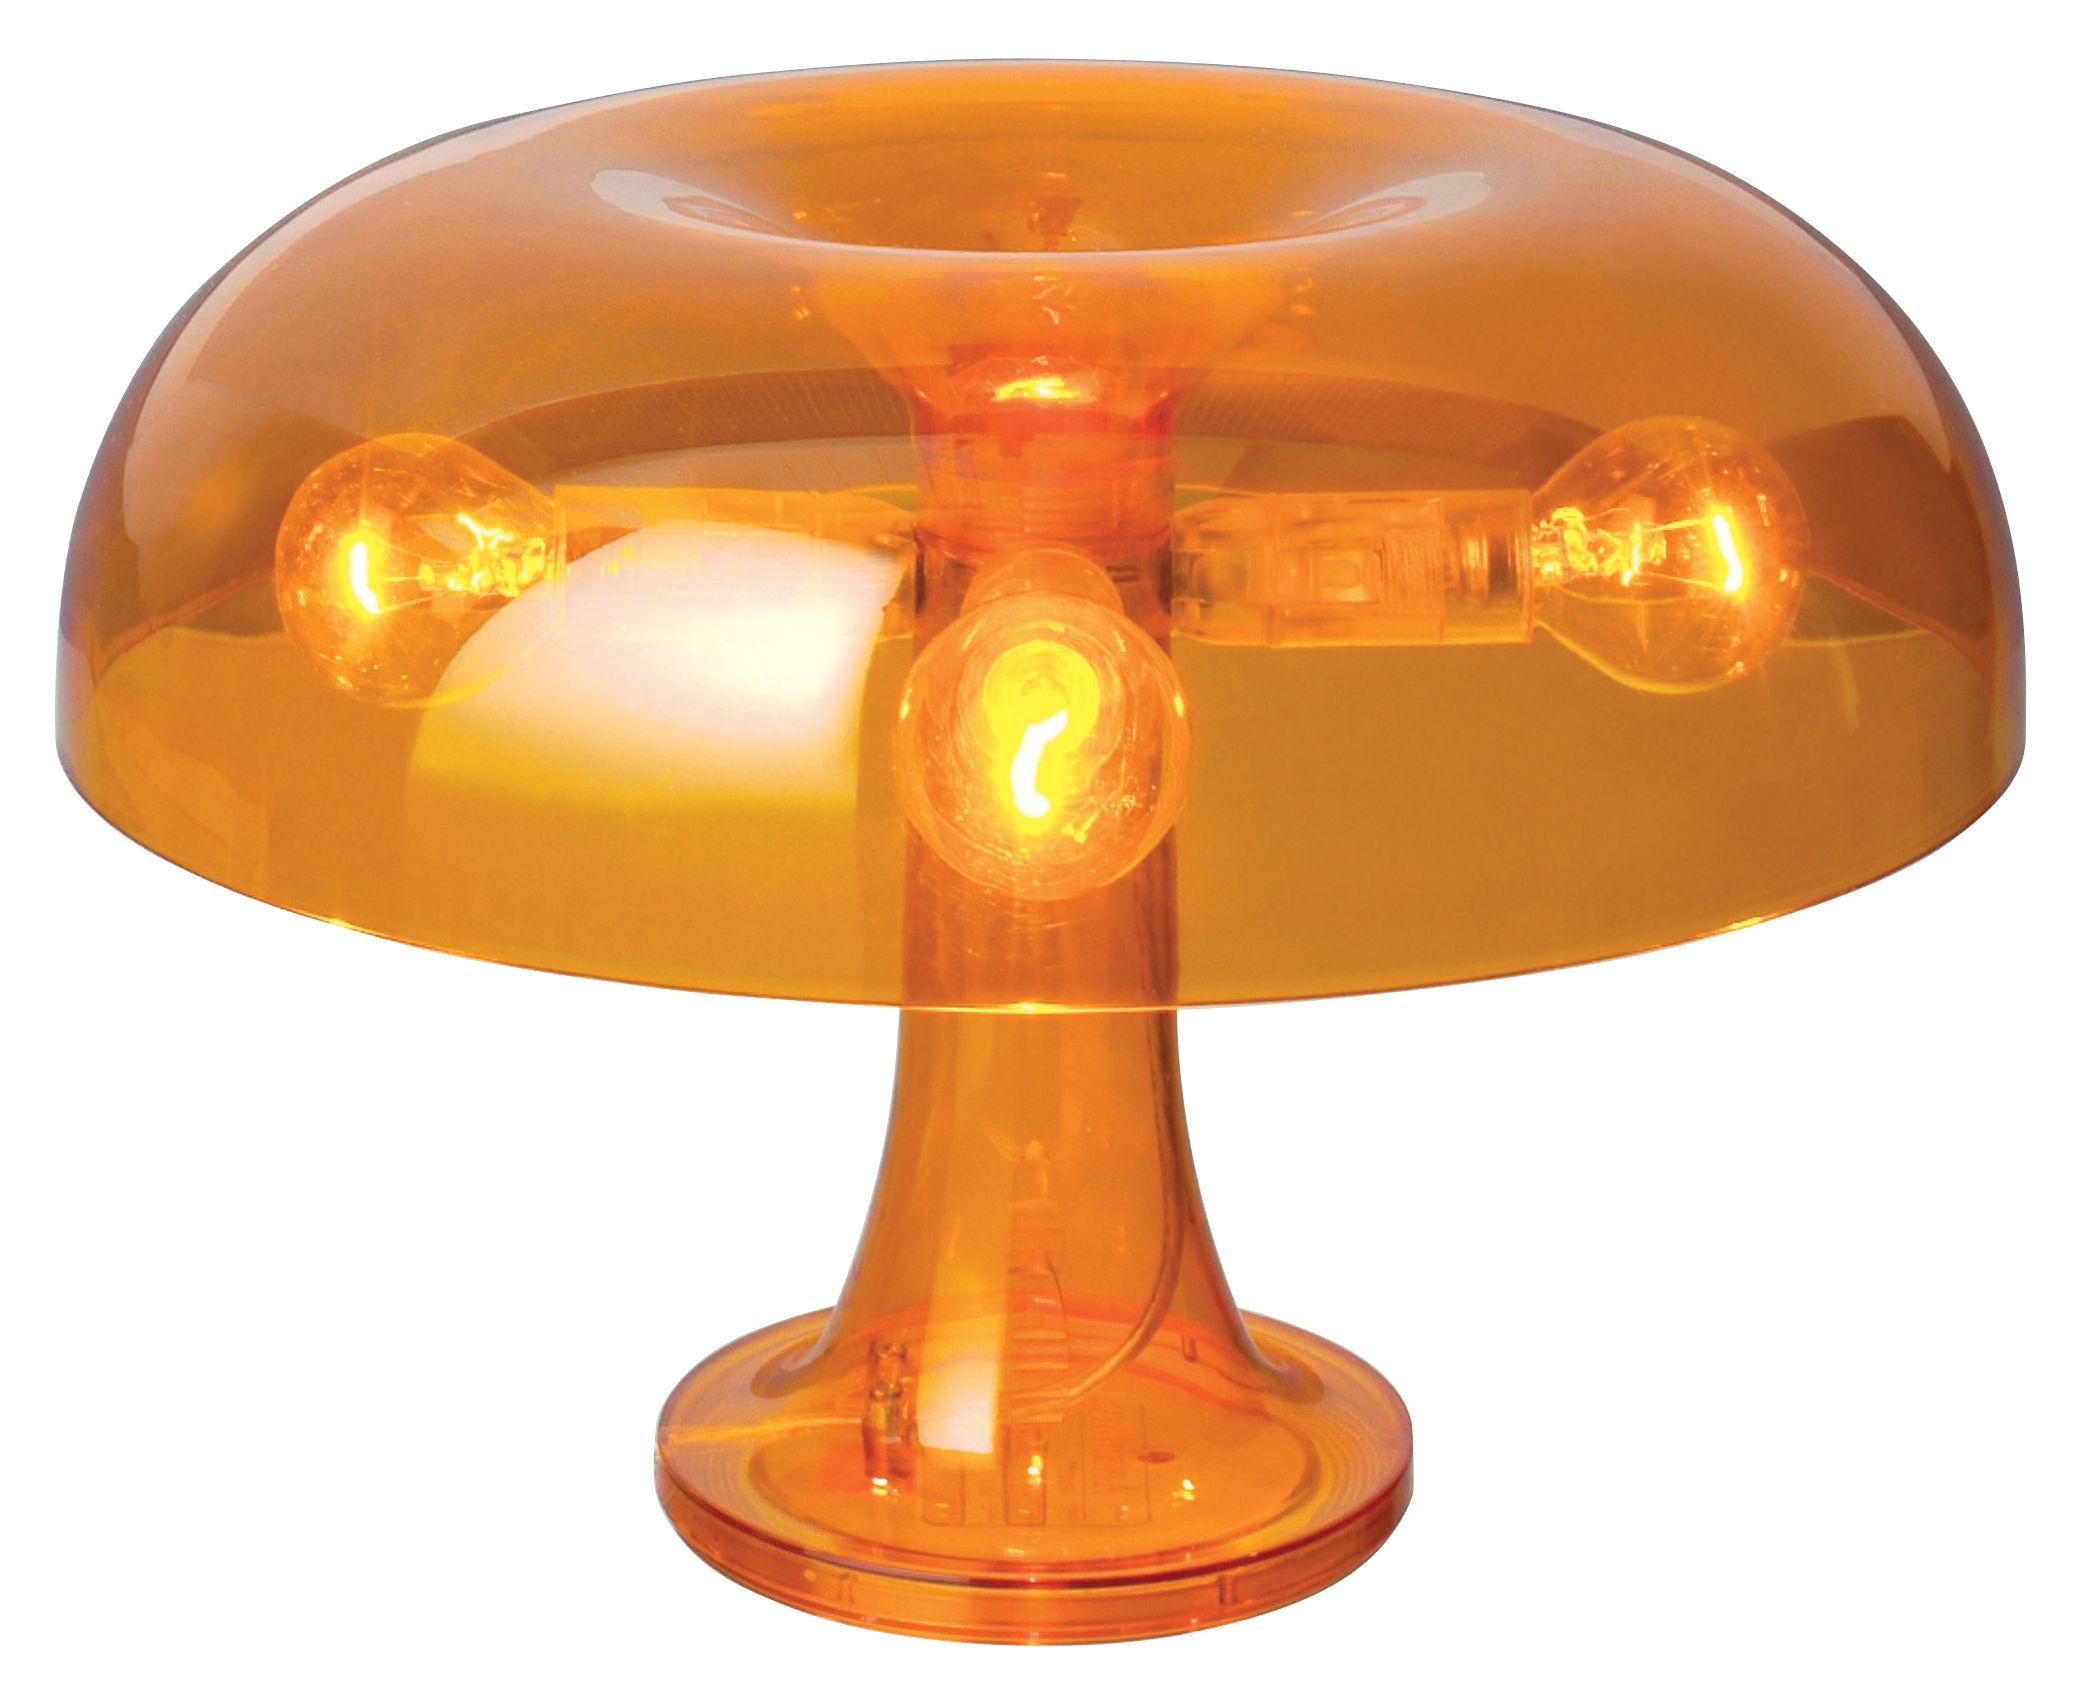 lampe de table nessino 32 cm orange transparent artemide. Black Bedroom Furniture Sets. Home Design Ideas